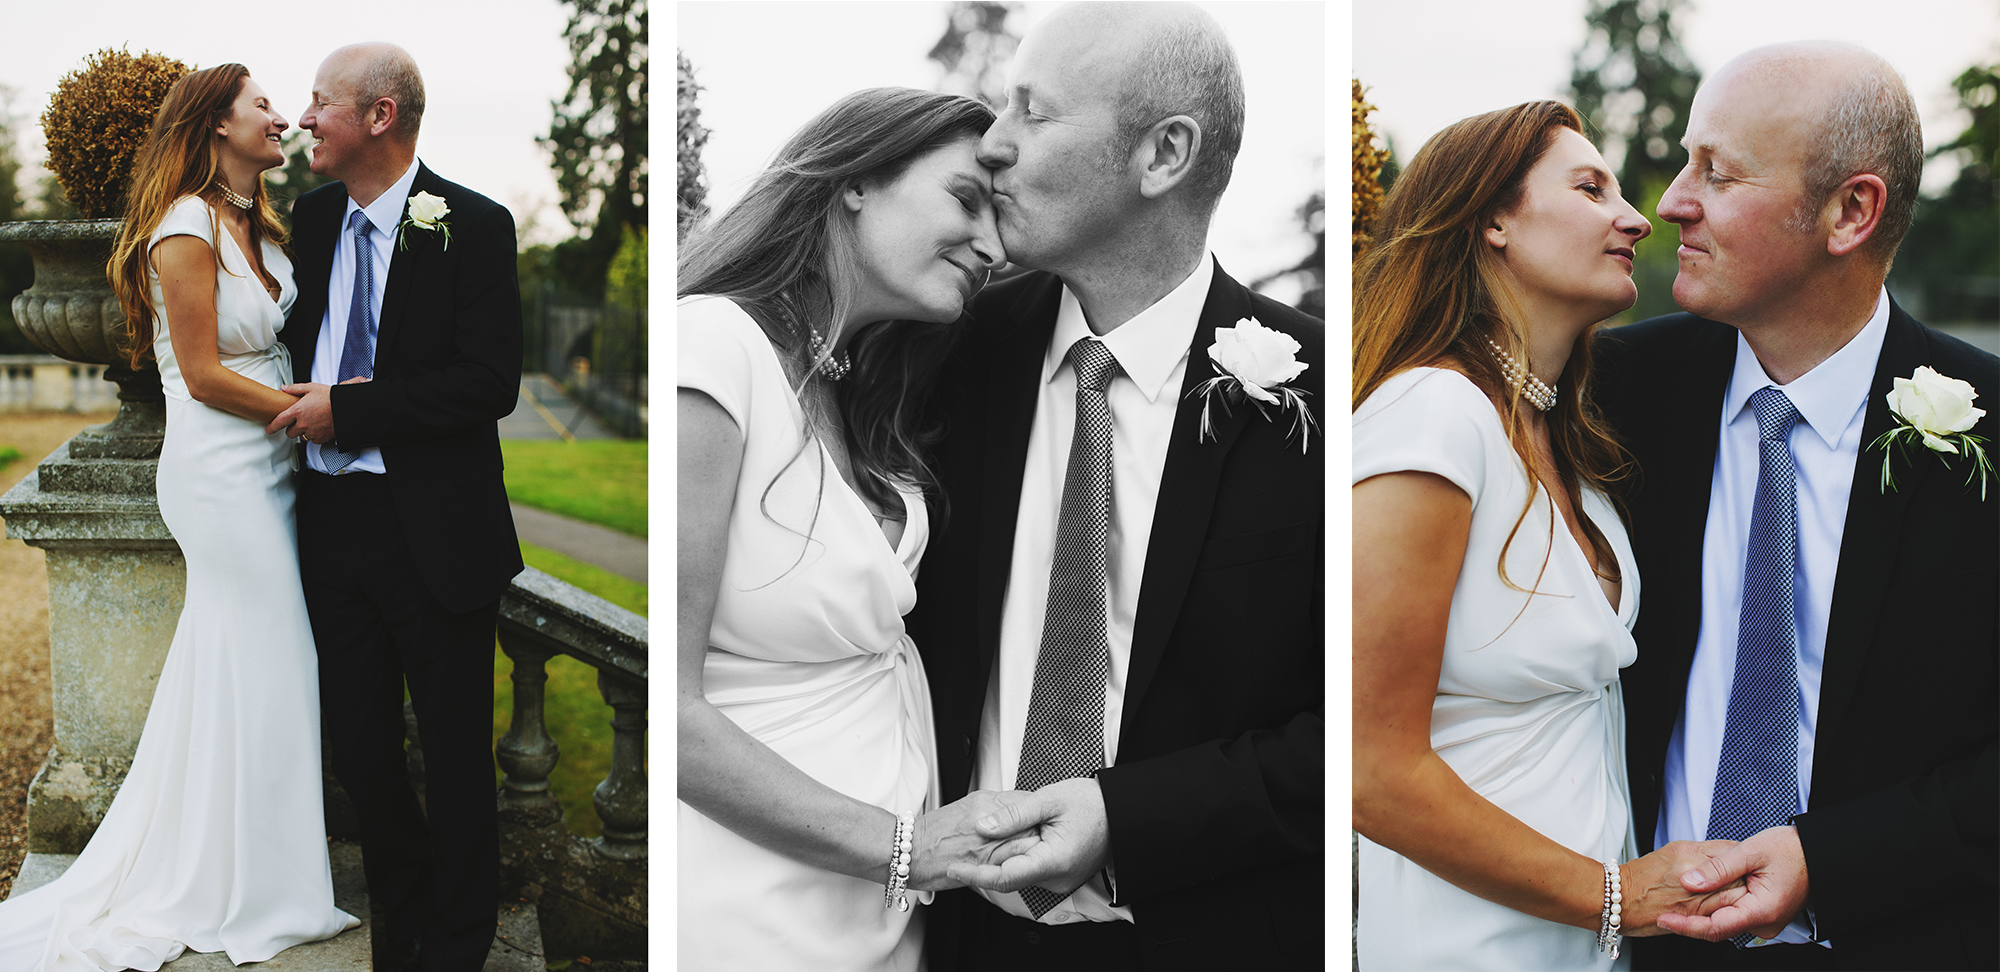 katie leask photography wedding la coco noire 0021